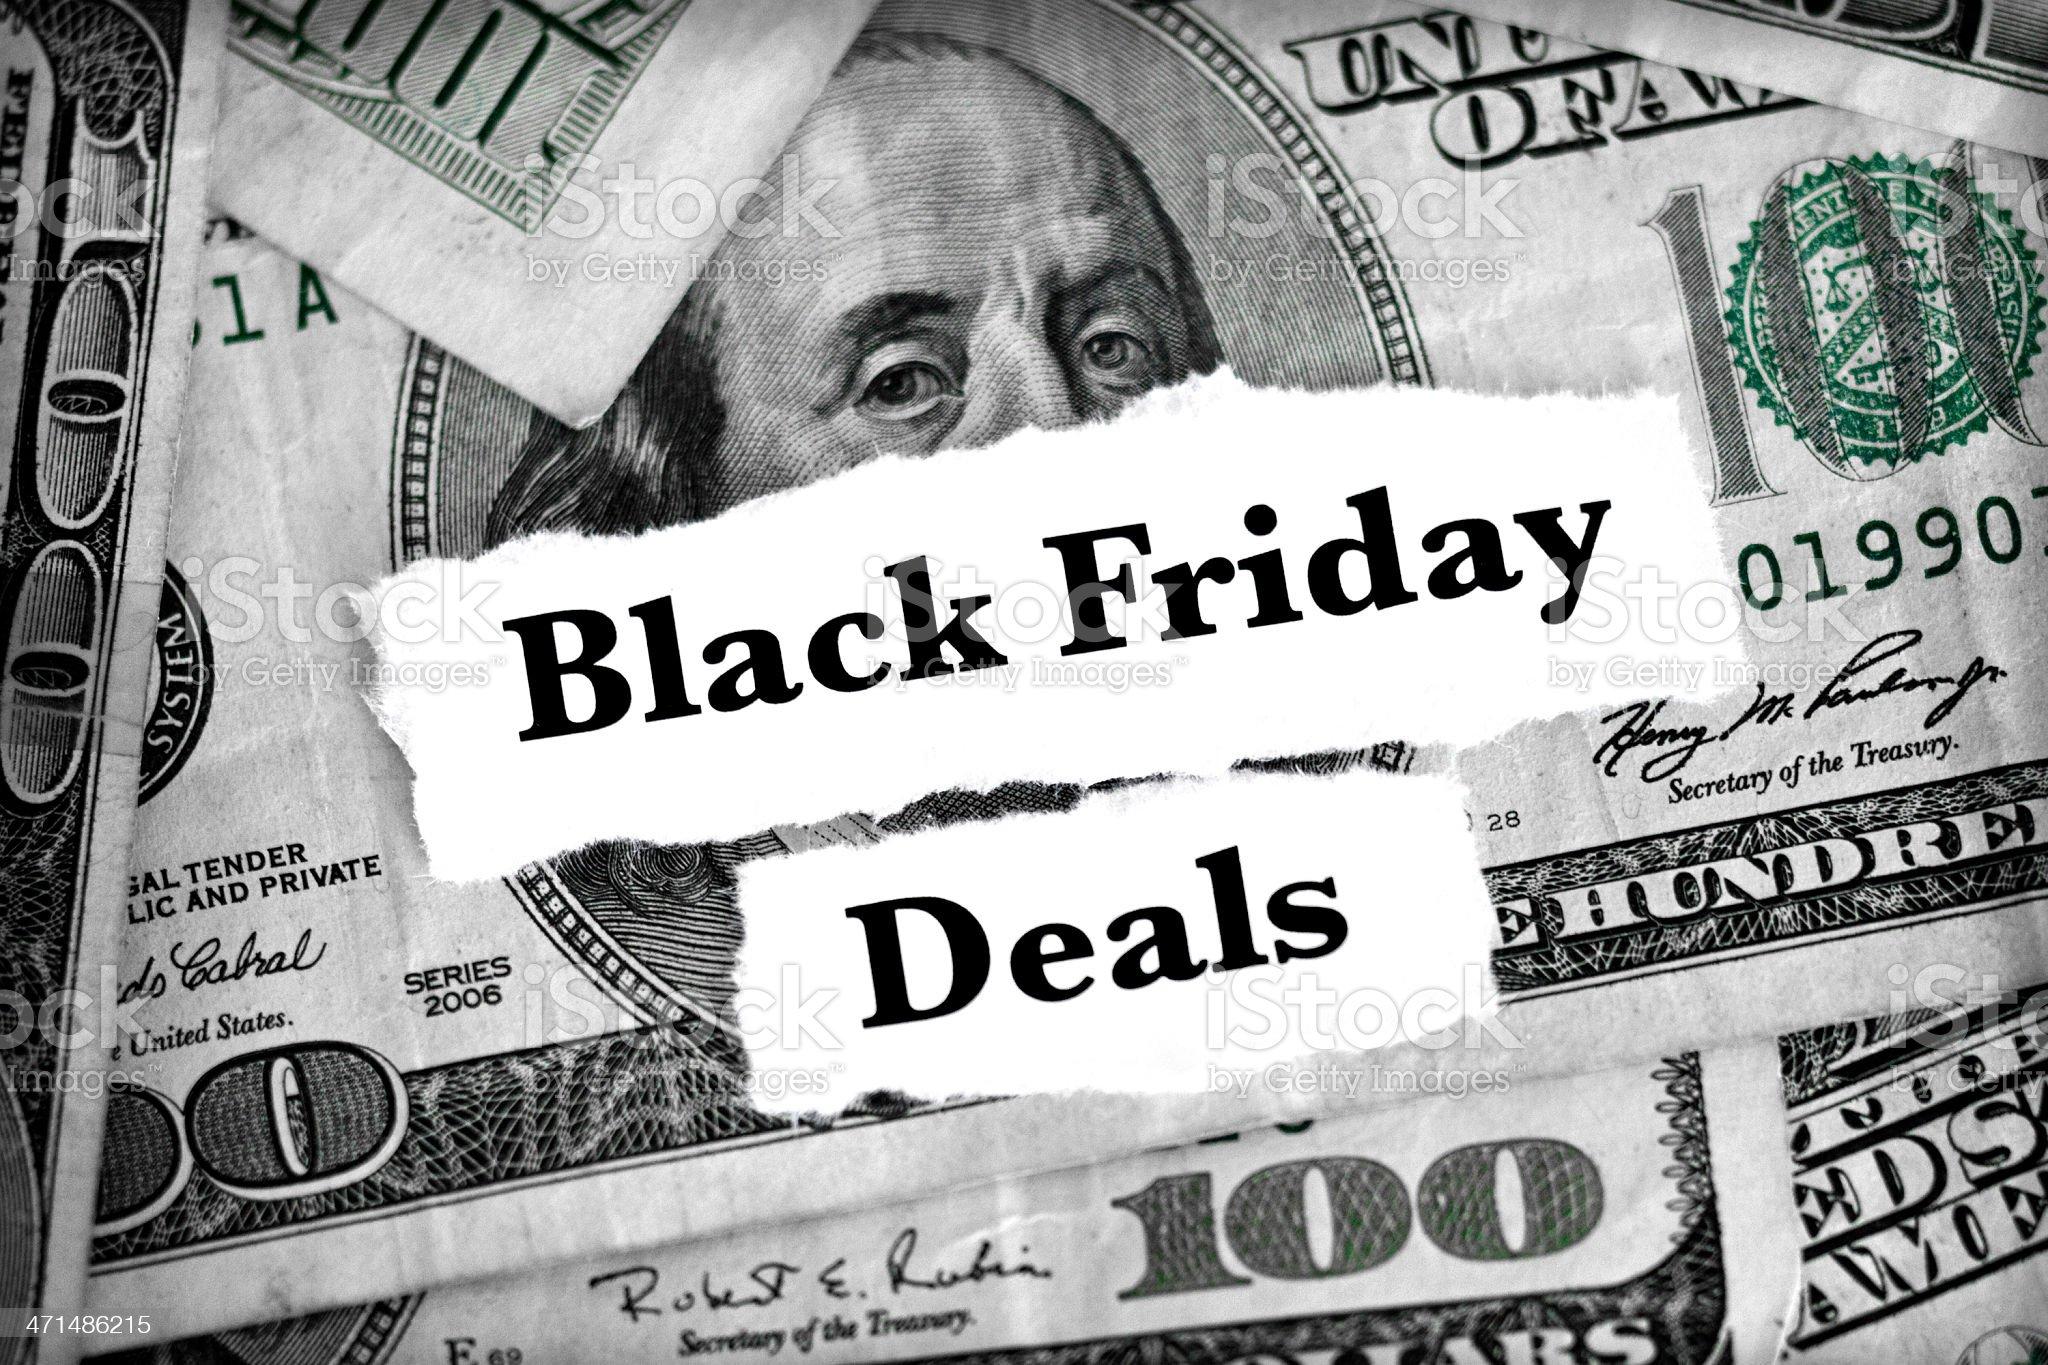 black friday deals royalty-free stock photo